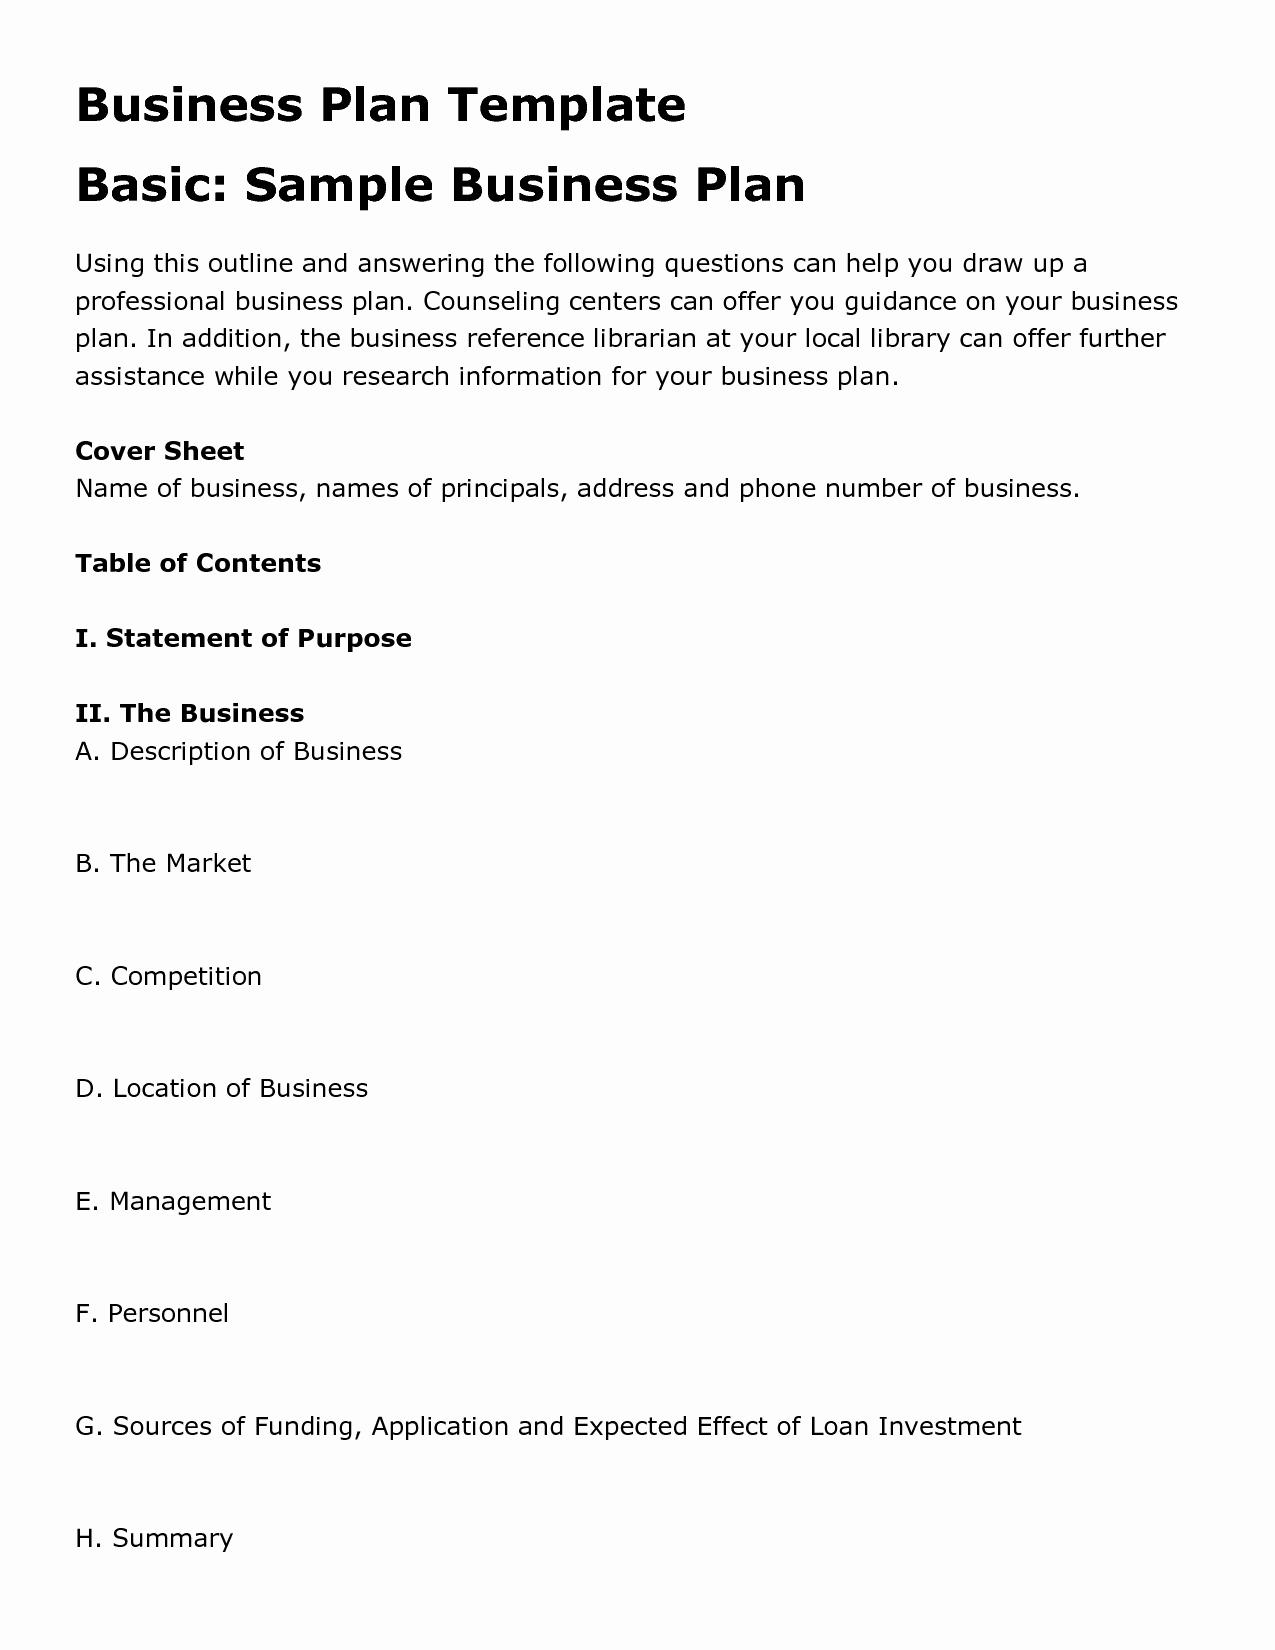 Business Proposal Template Pdf Inspirational Printable Sample Business Plan Template form